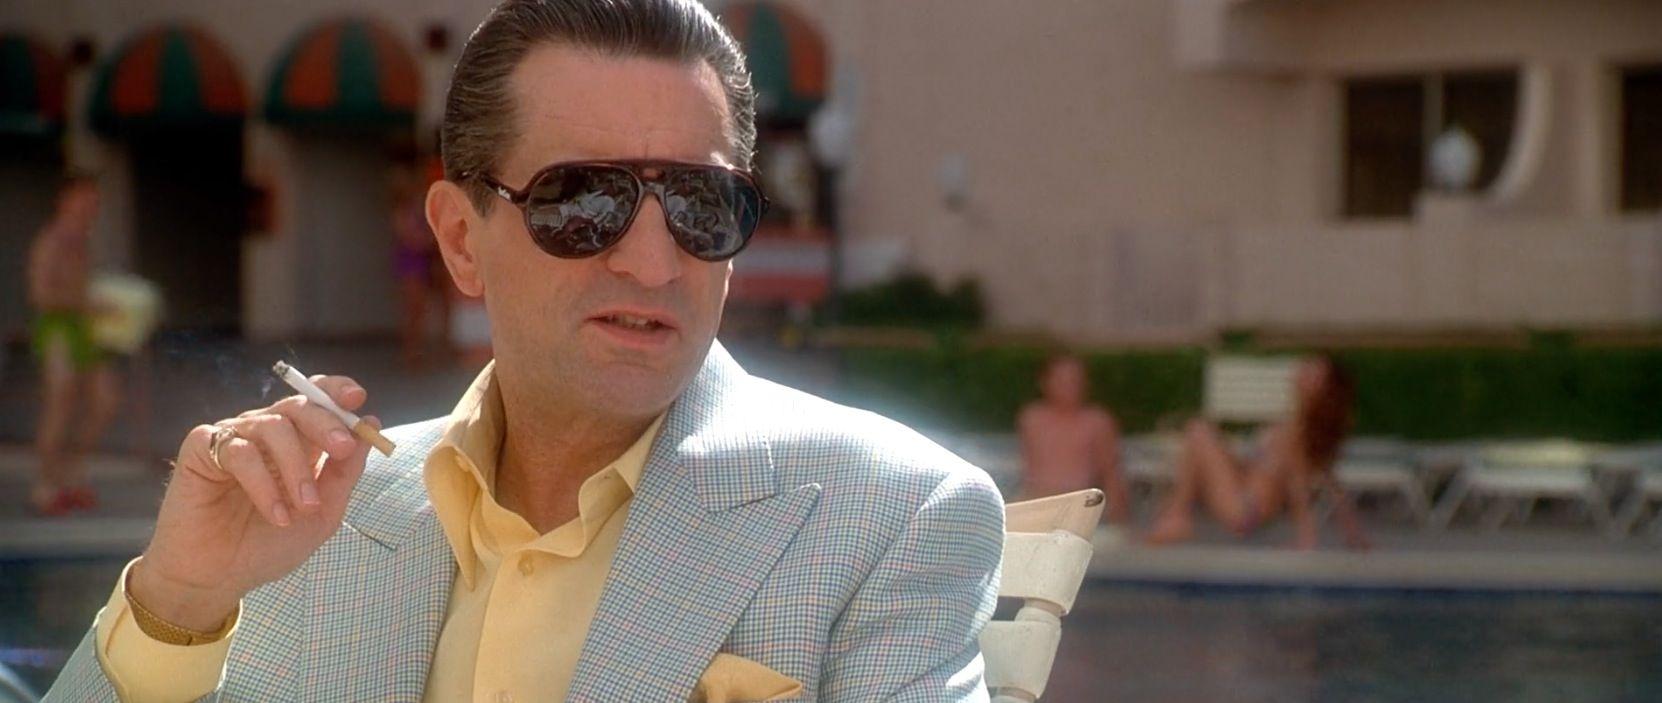 81b16bdfa0b72 Carrera 5425 sunglasses worn by Robert De Niro in CASINO (1995)   carreraworld